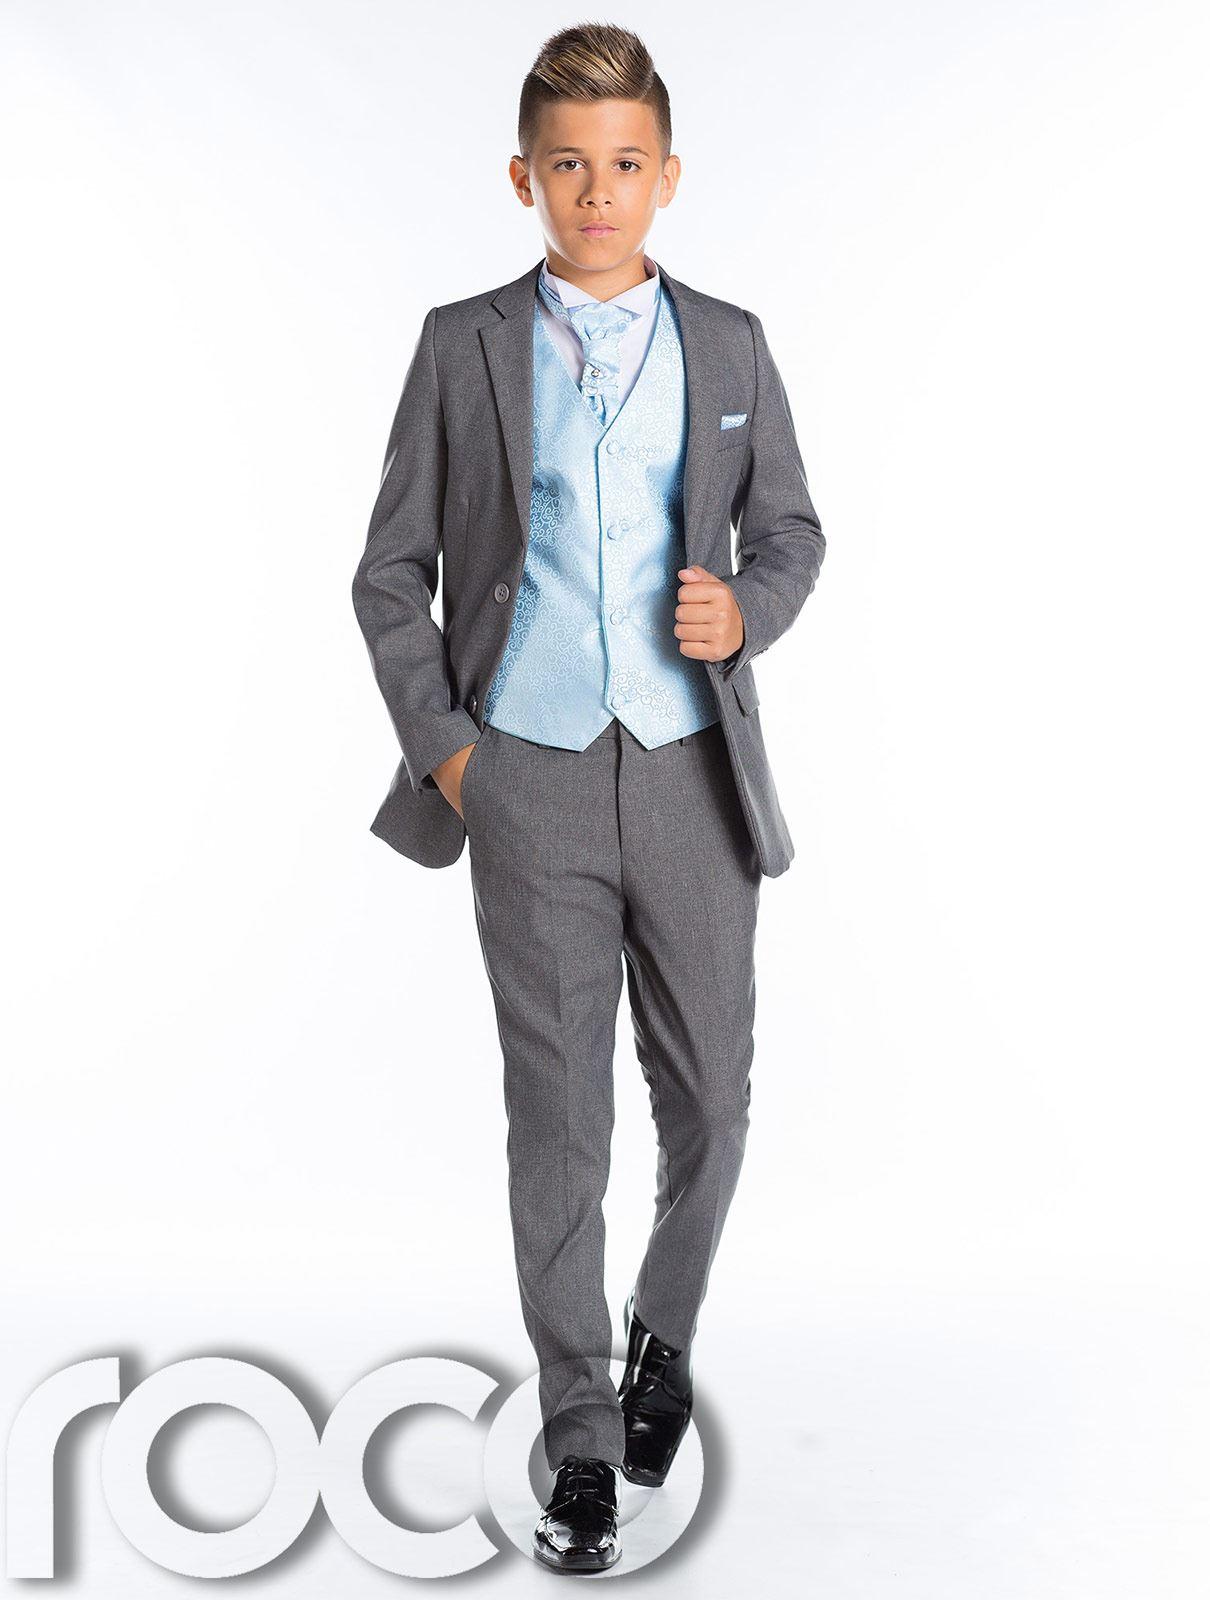 boys cream waistcoat suit boys wedding suit boys cravat